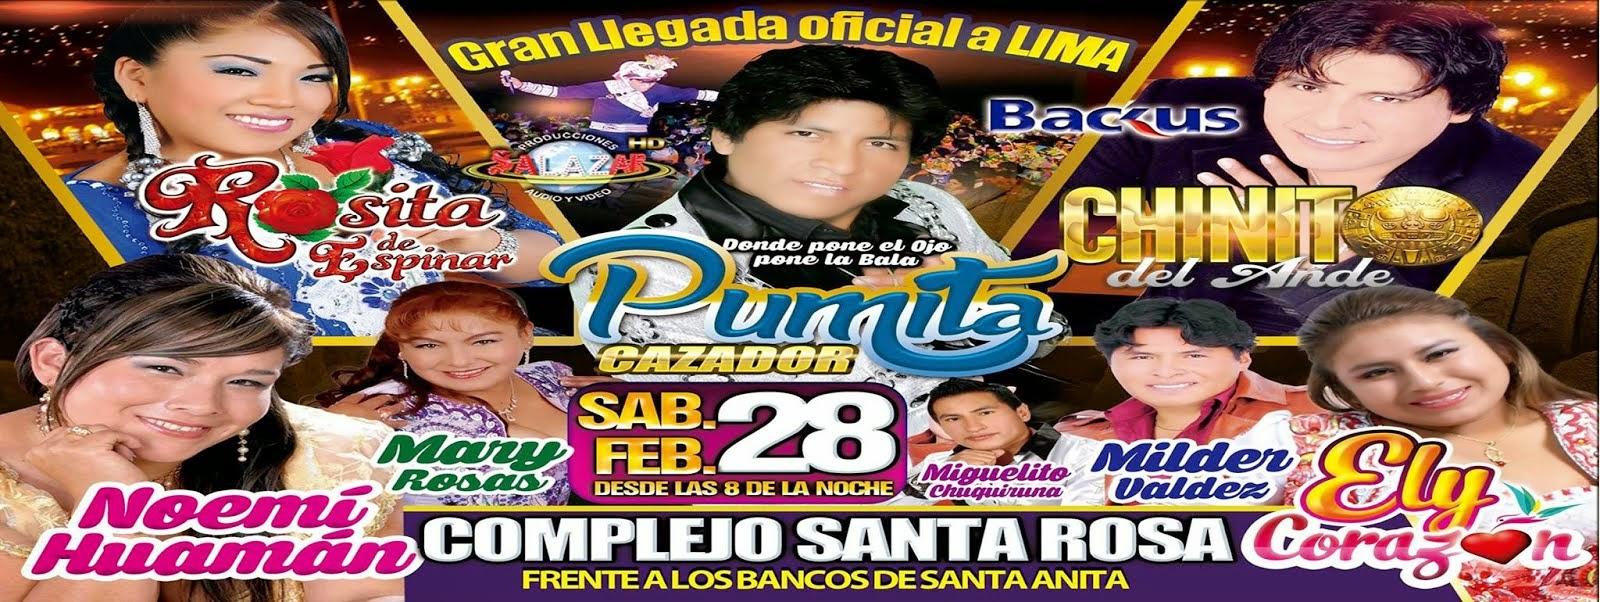 Pumita Cazador llega a Lima, este sábado 28 de febrero